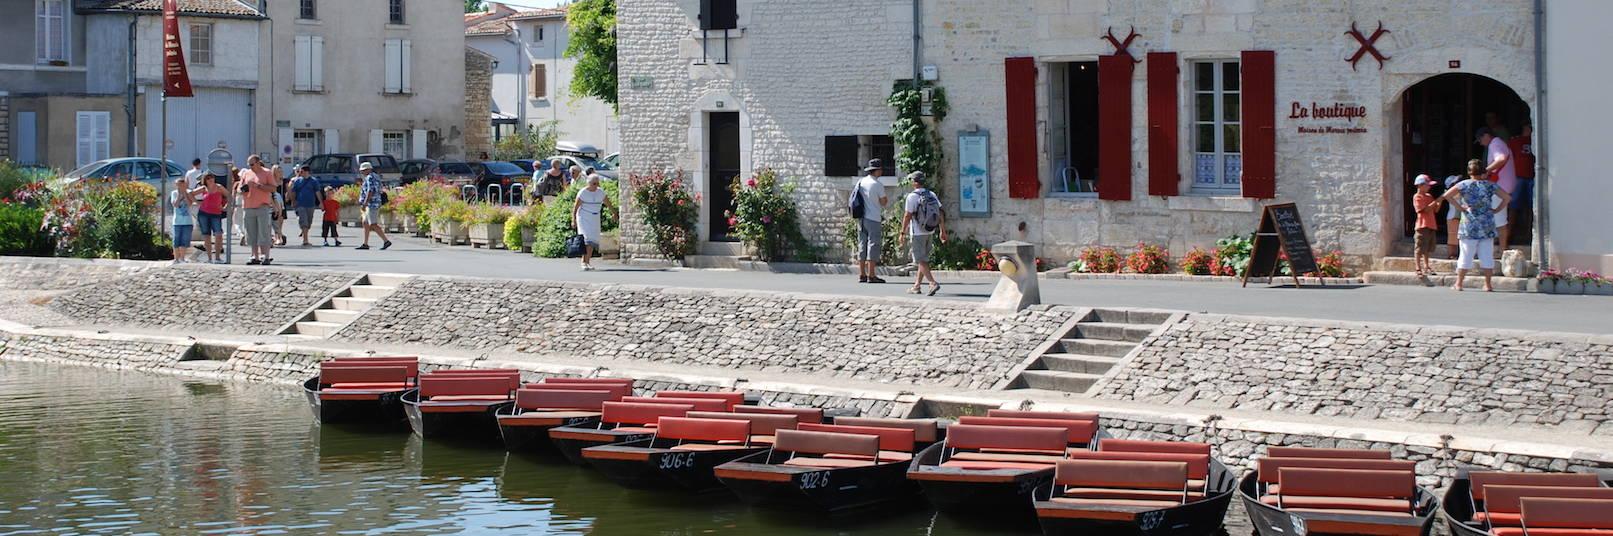 Visit Coulon in the Marais poitevin